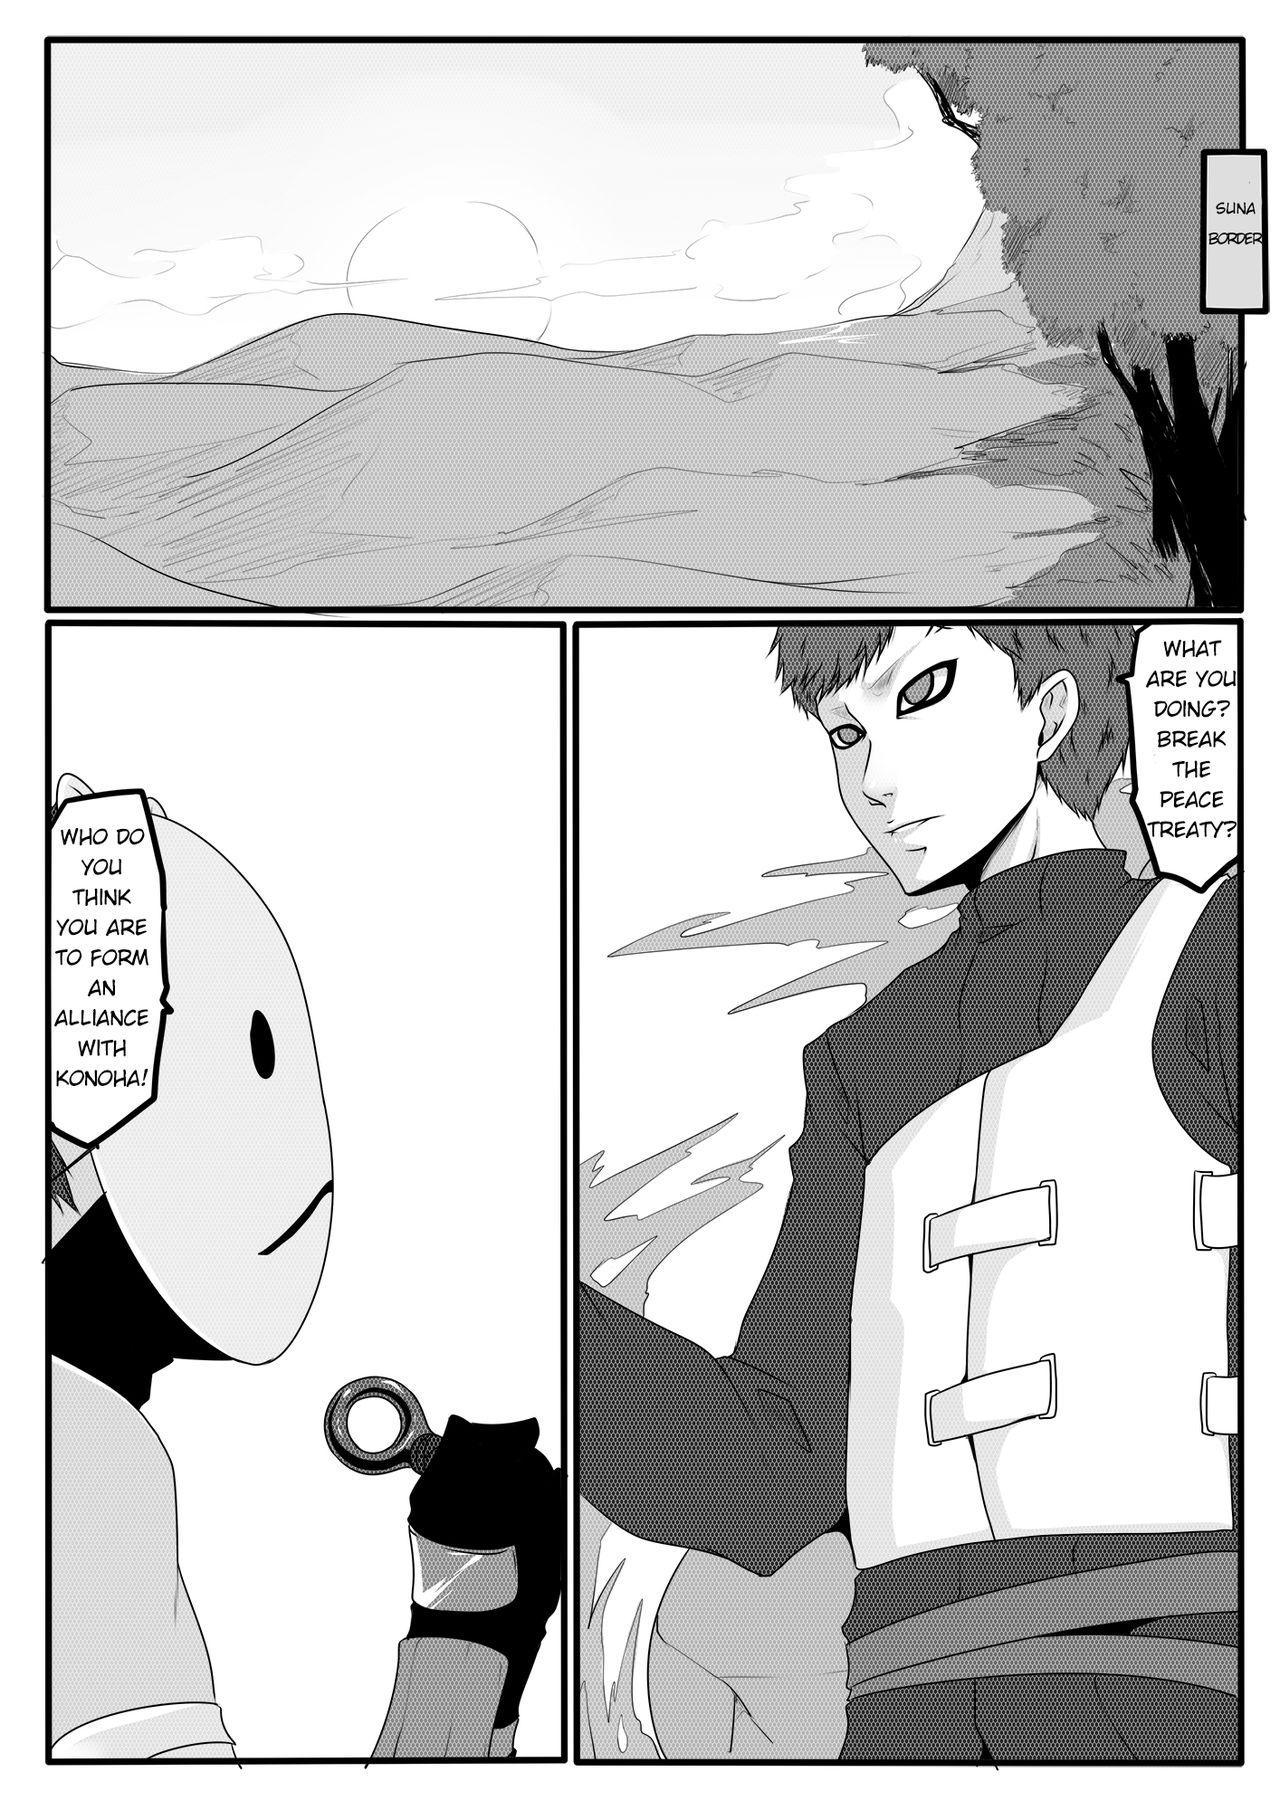 [GoDLeTTeR] Kunoichi Jigoku Daisanmaku (Naruto) ENG 9